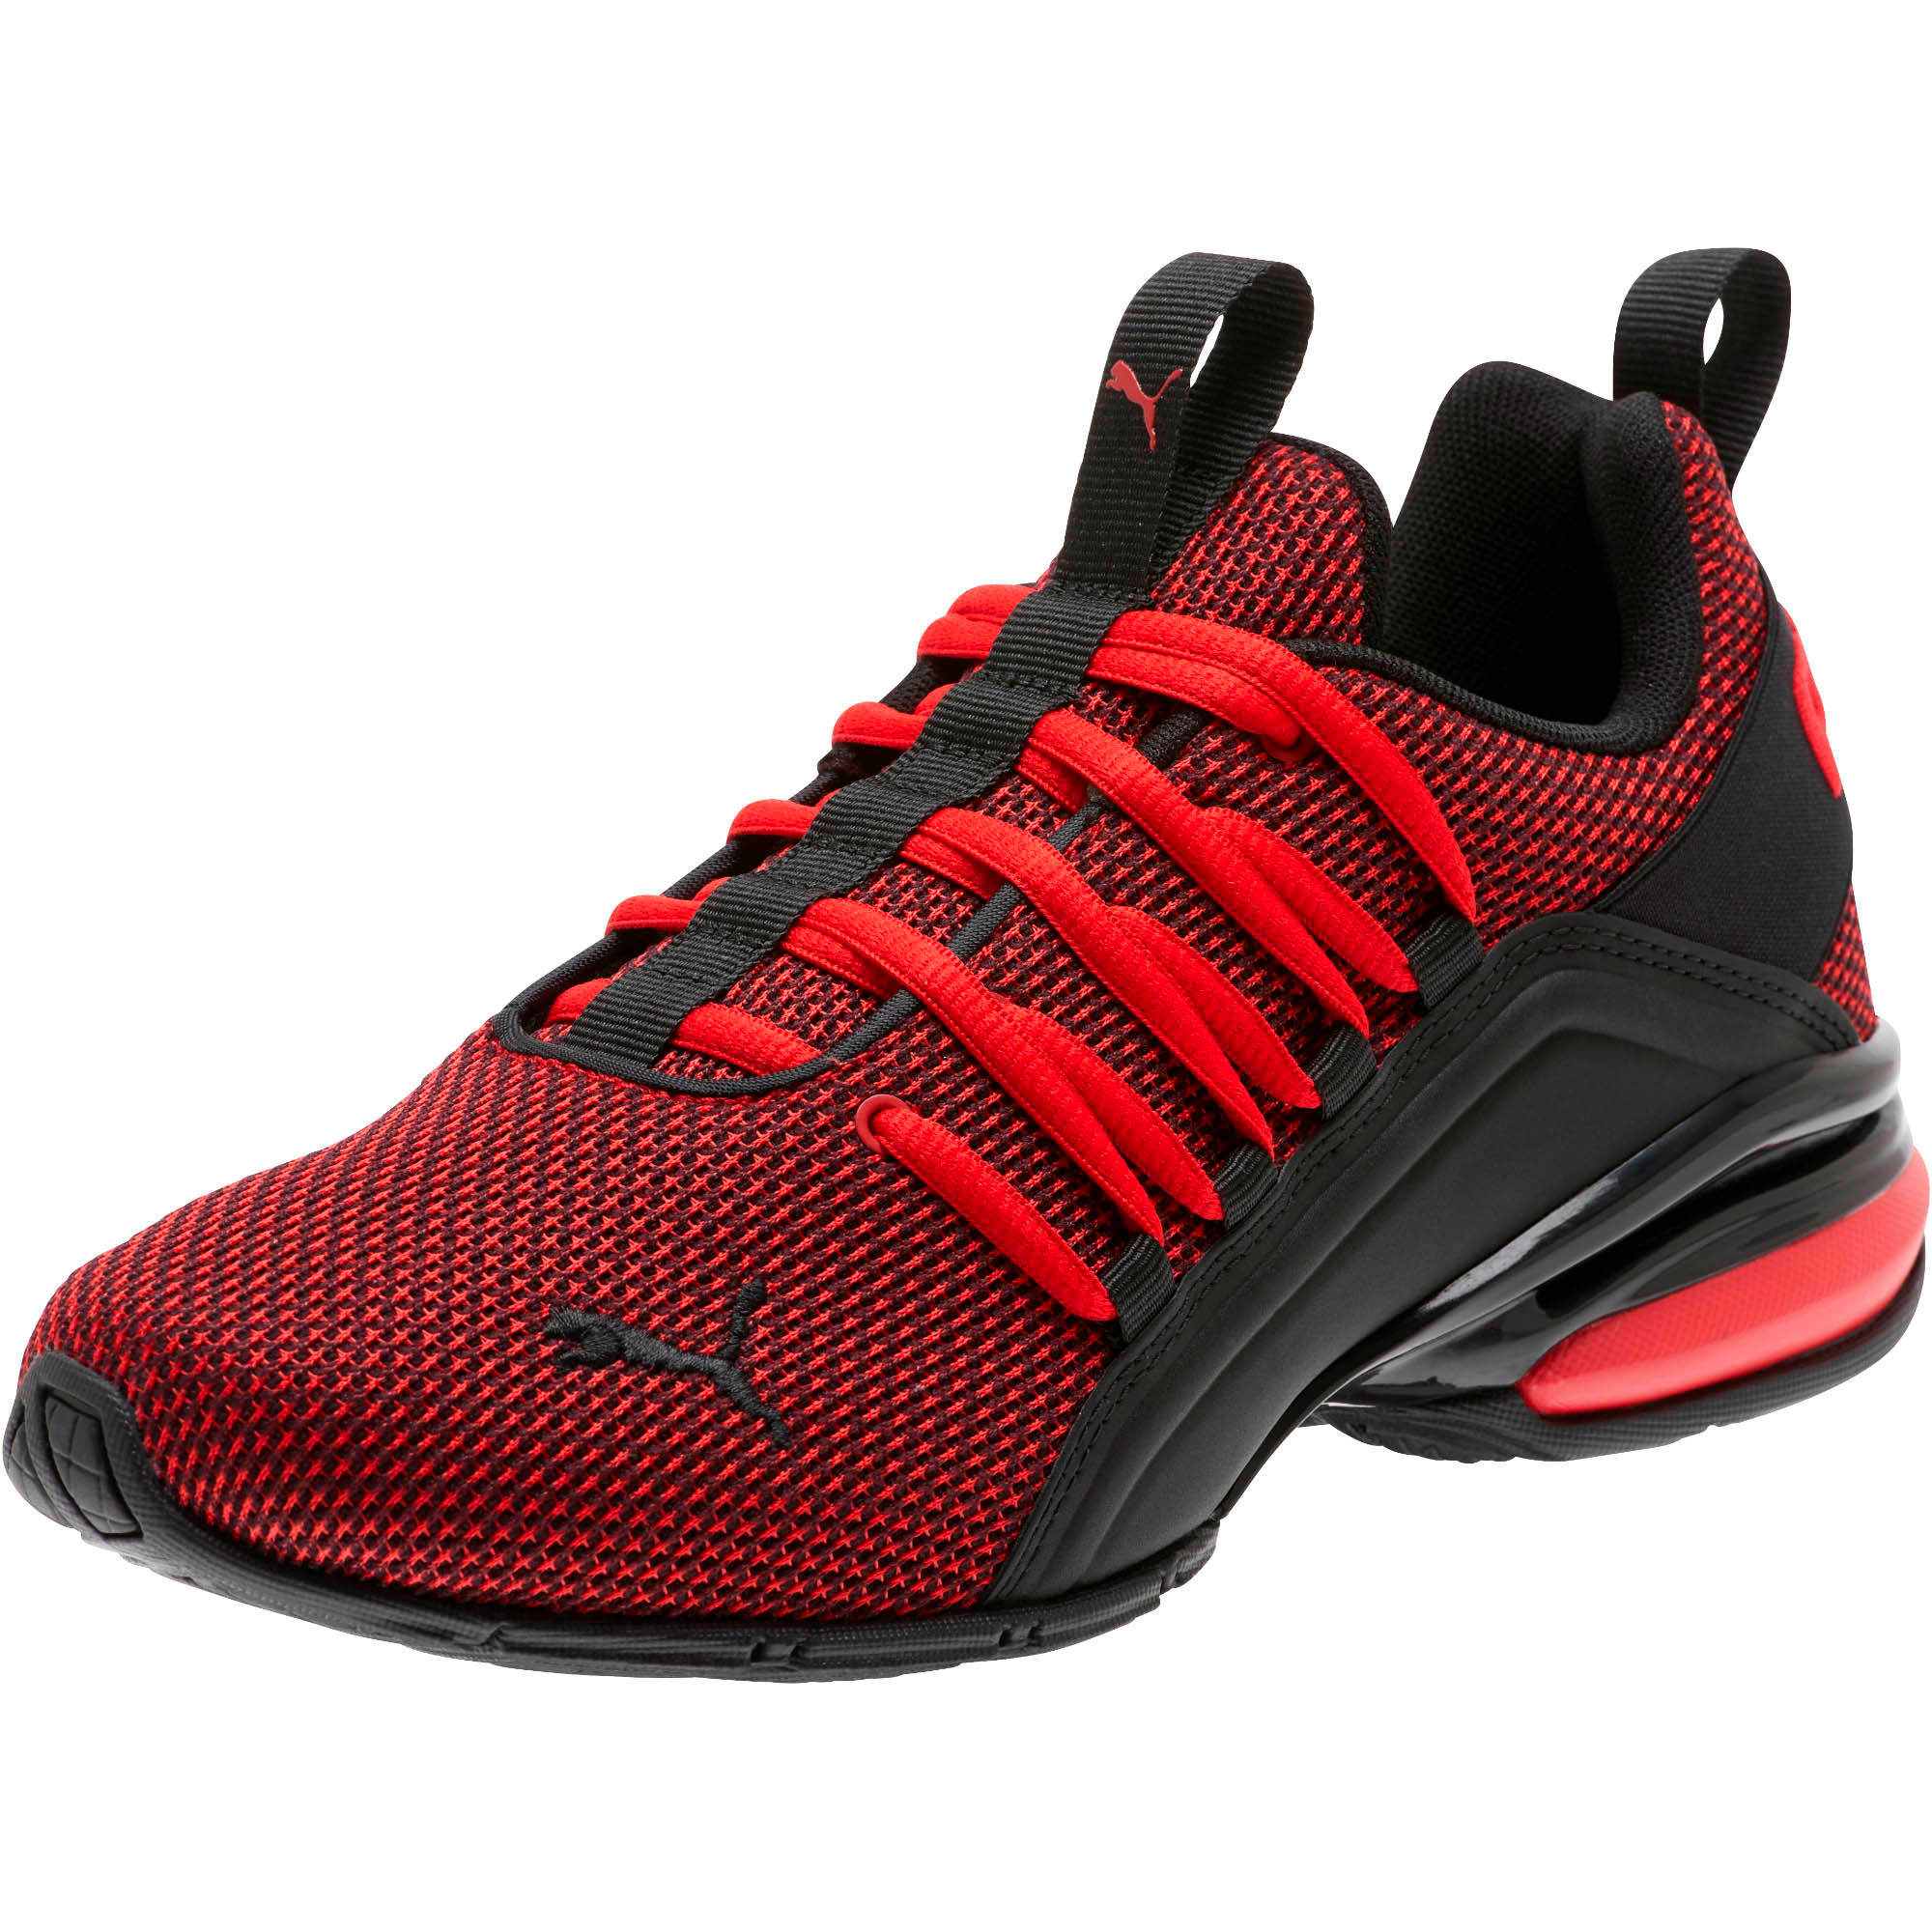 Thumbnail 1 of Axelion NM Training Shoes JR, High Risk Red-Puma Black, medium